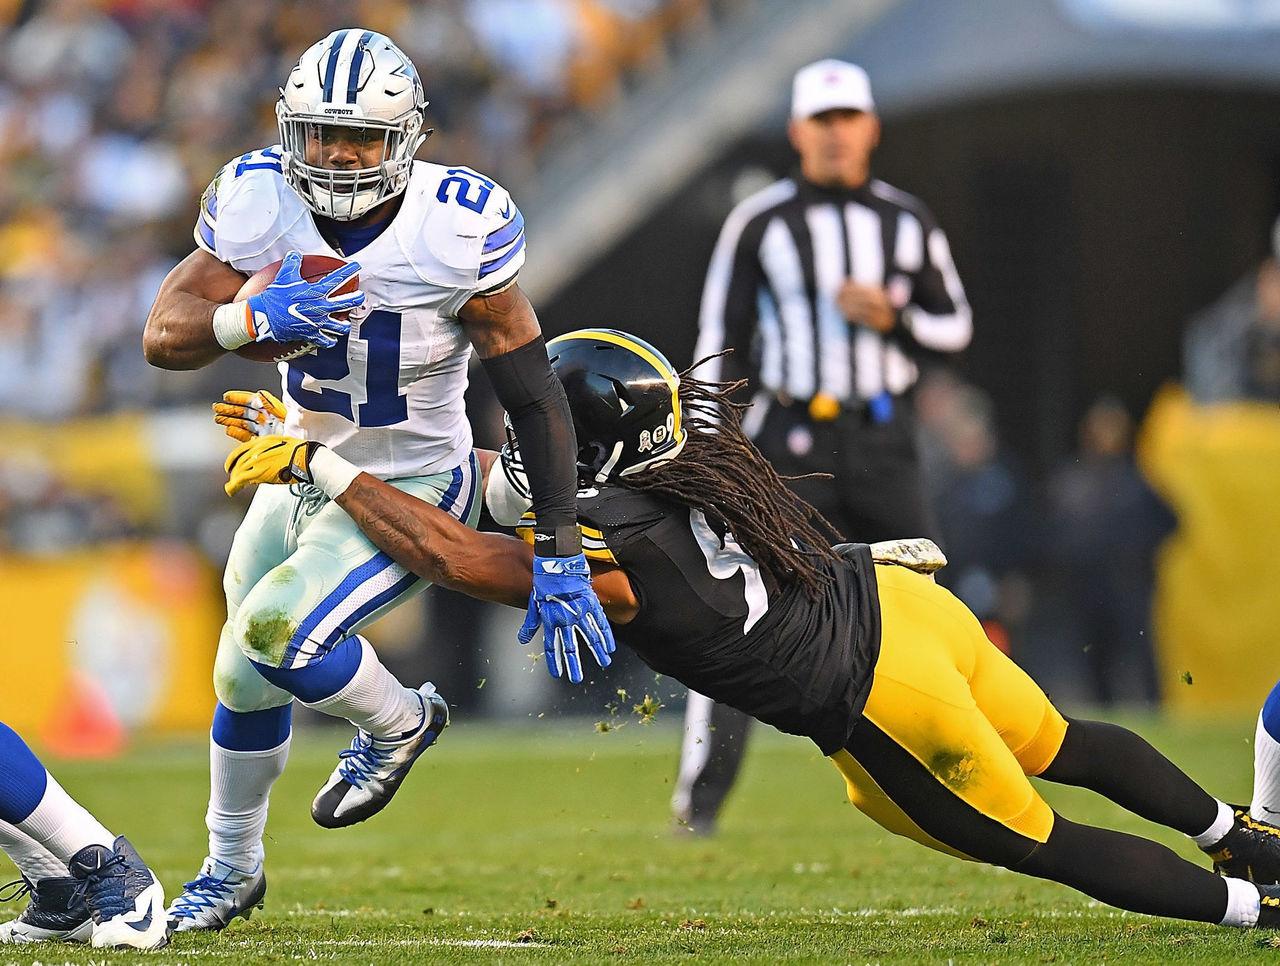 NFL's 5 best games of 2016